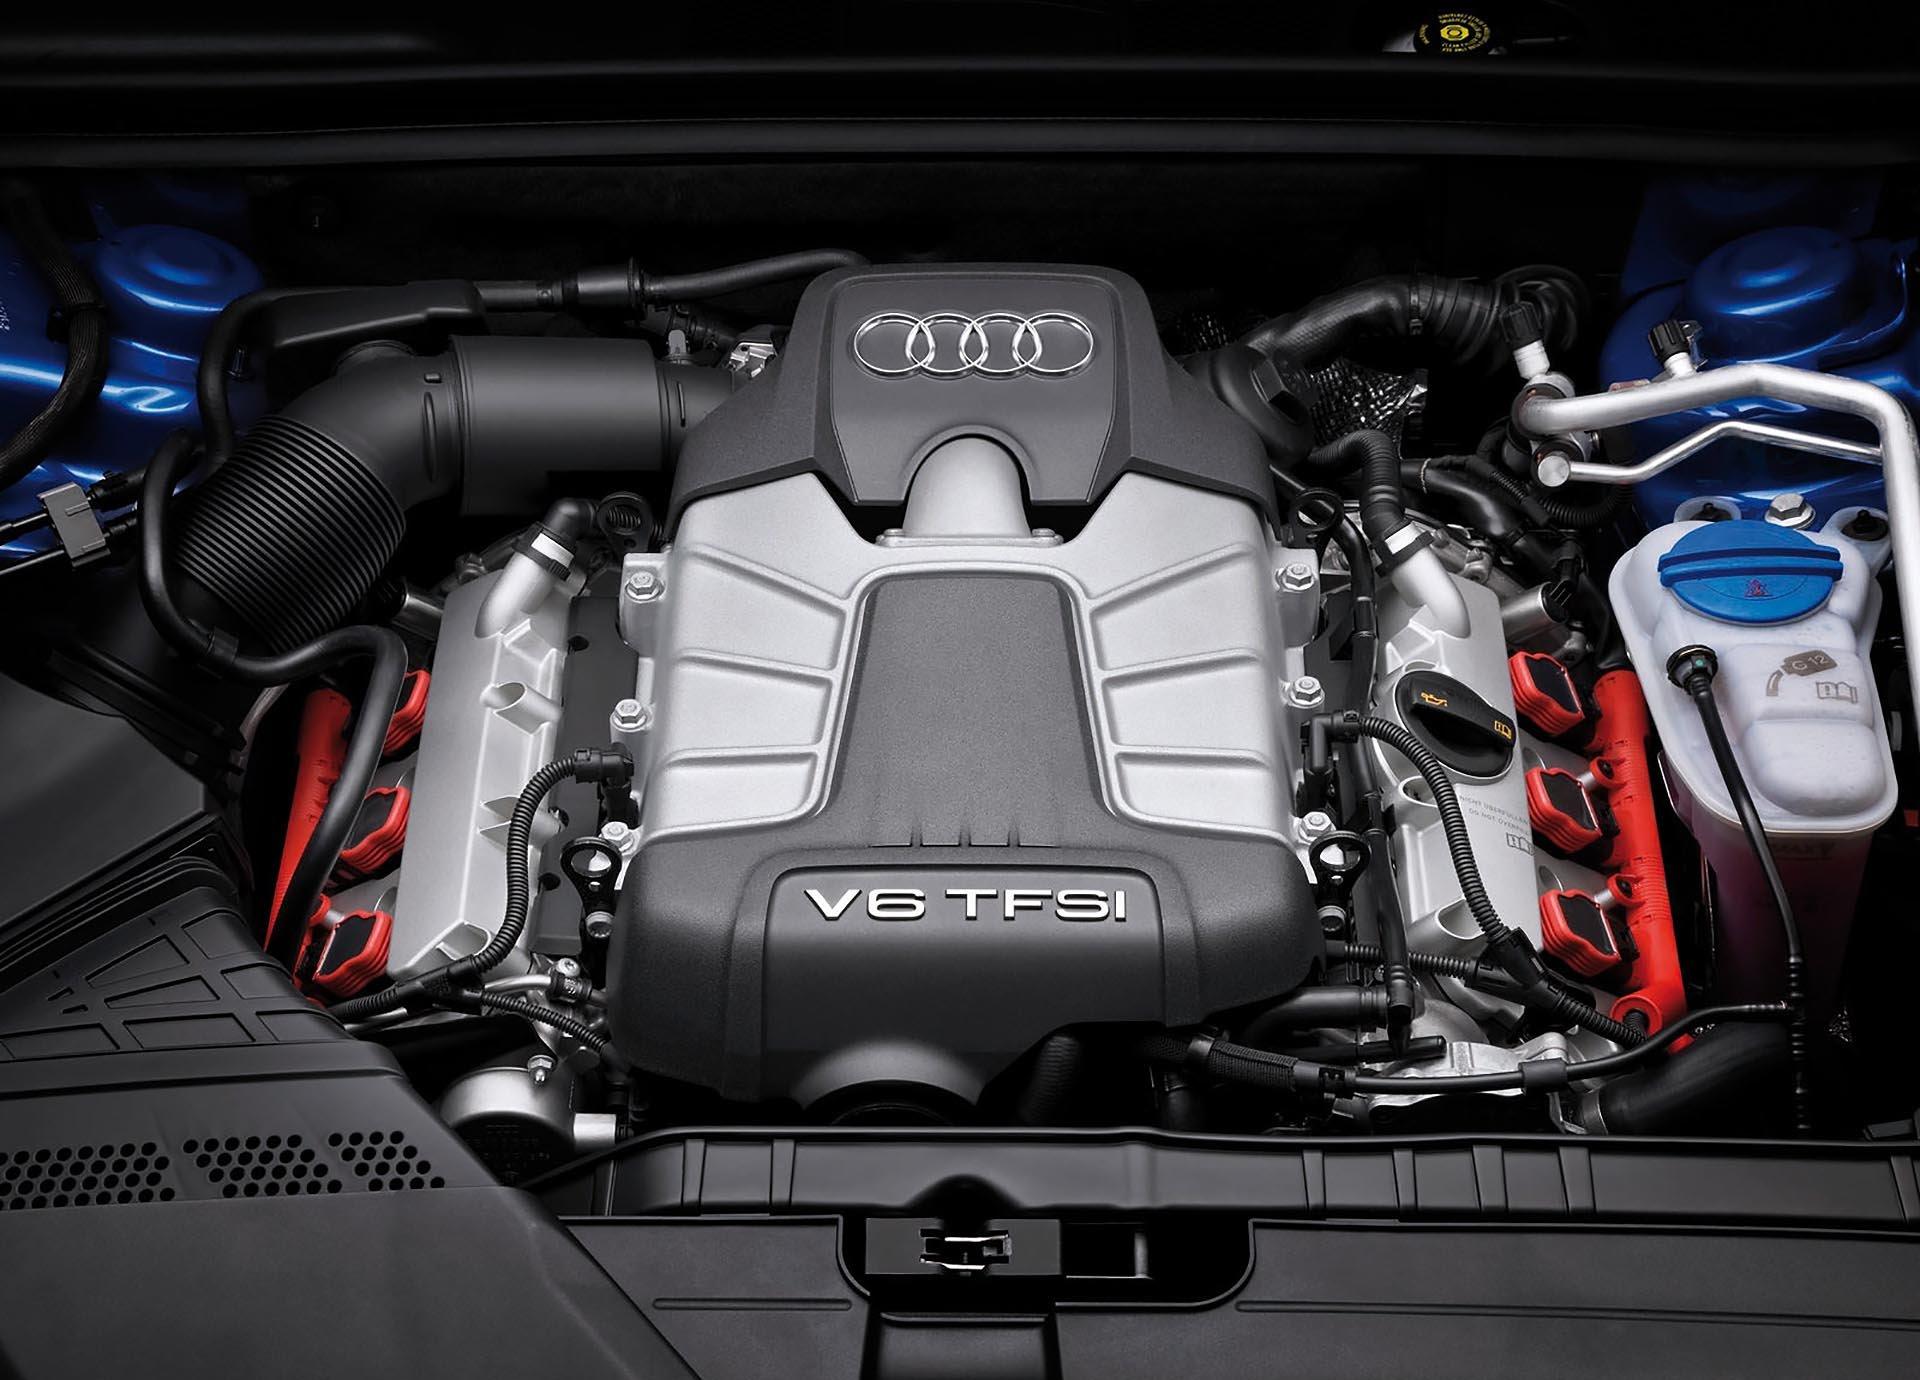 Audi S4 S5 3.0t TFSI engine bay